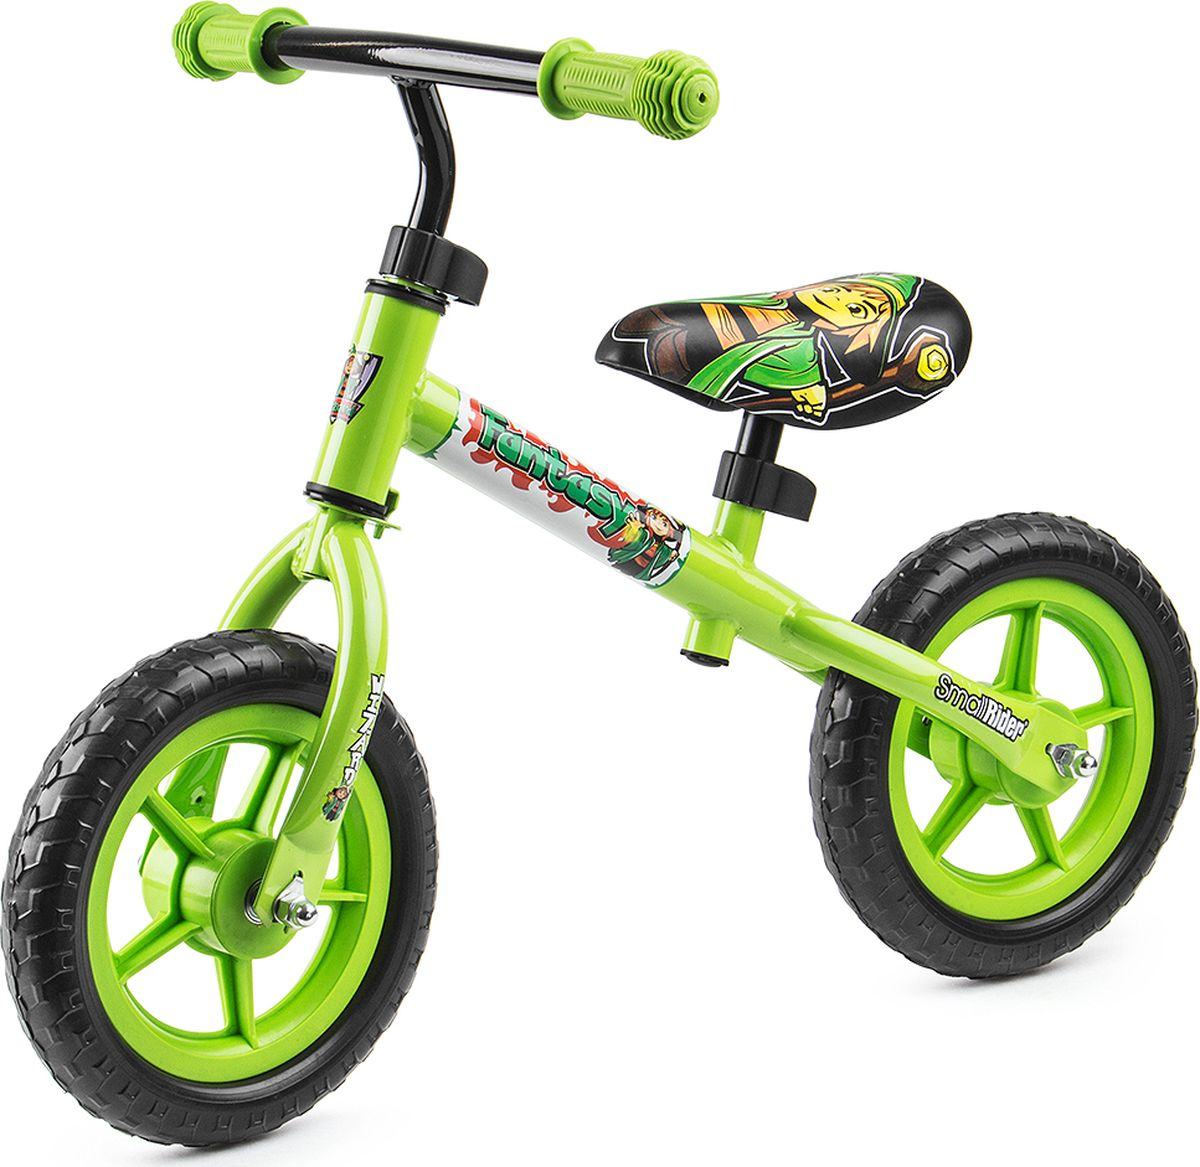 Small Rider Беговел детский Fantasy цвет зеленый - Беговелы